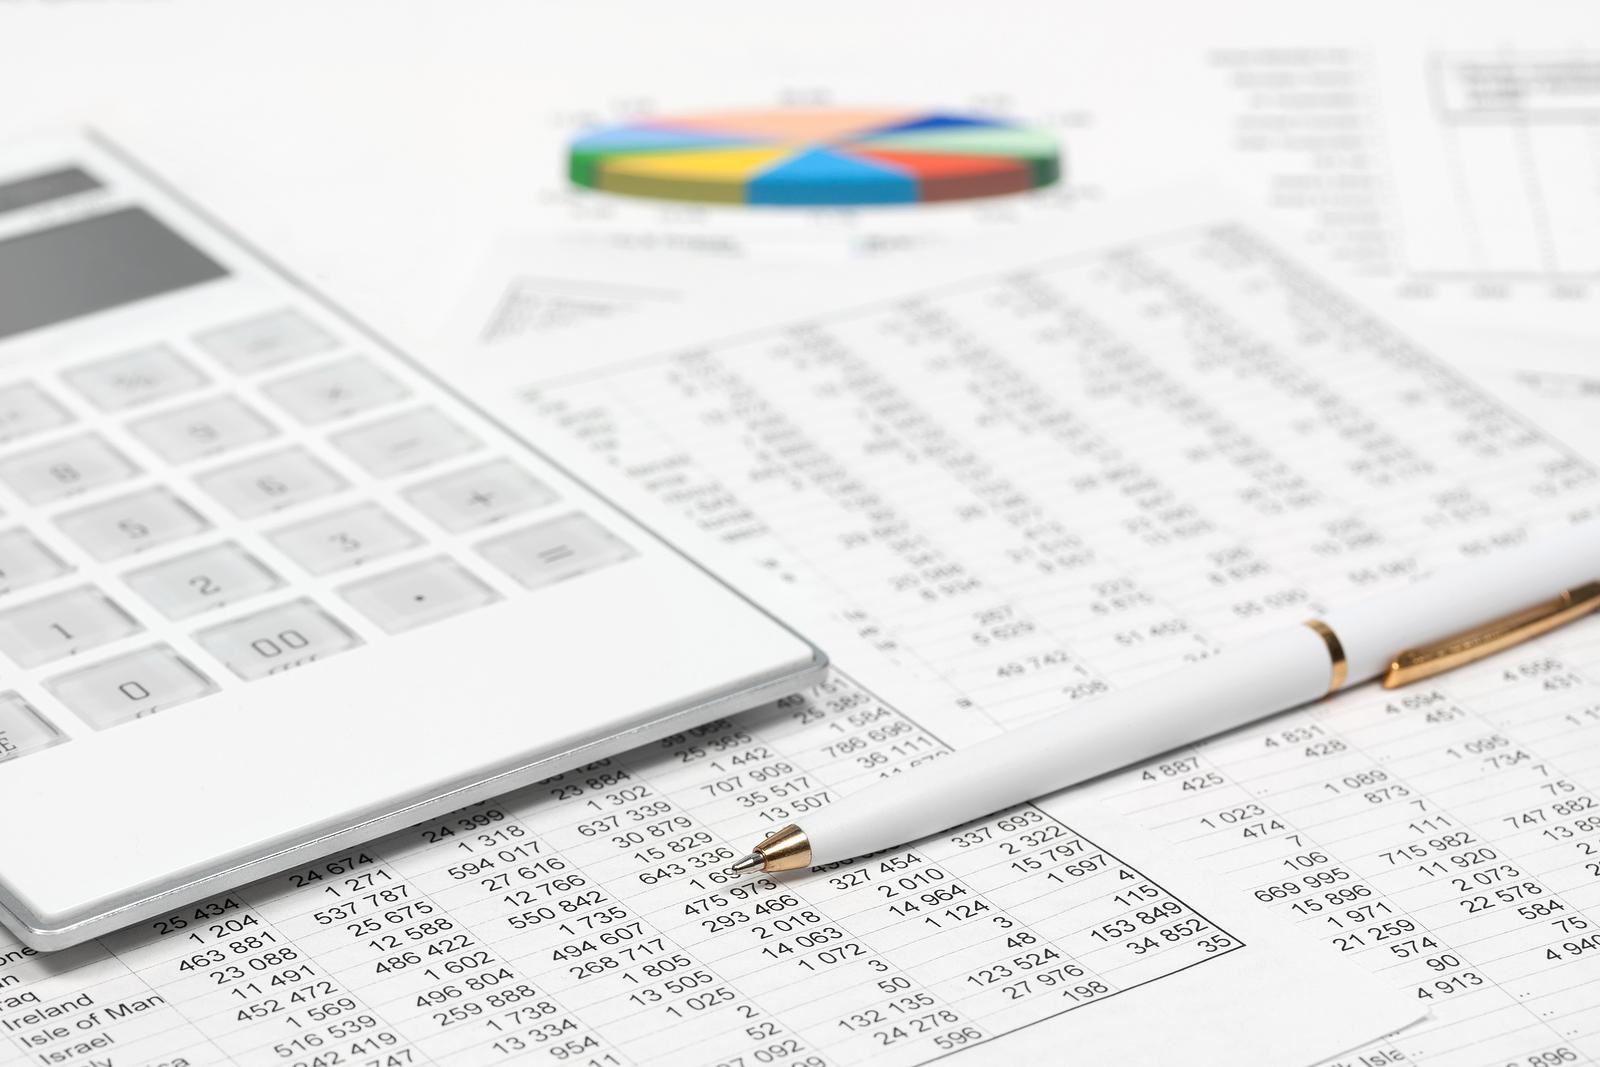 bigstock-Financial-accounting-stock-mar-170206634.jpg